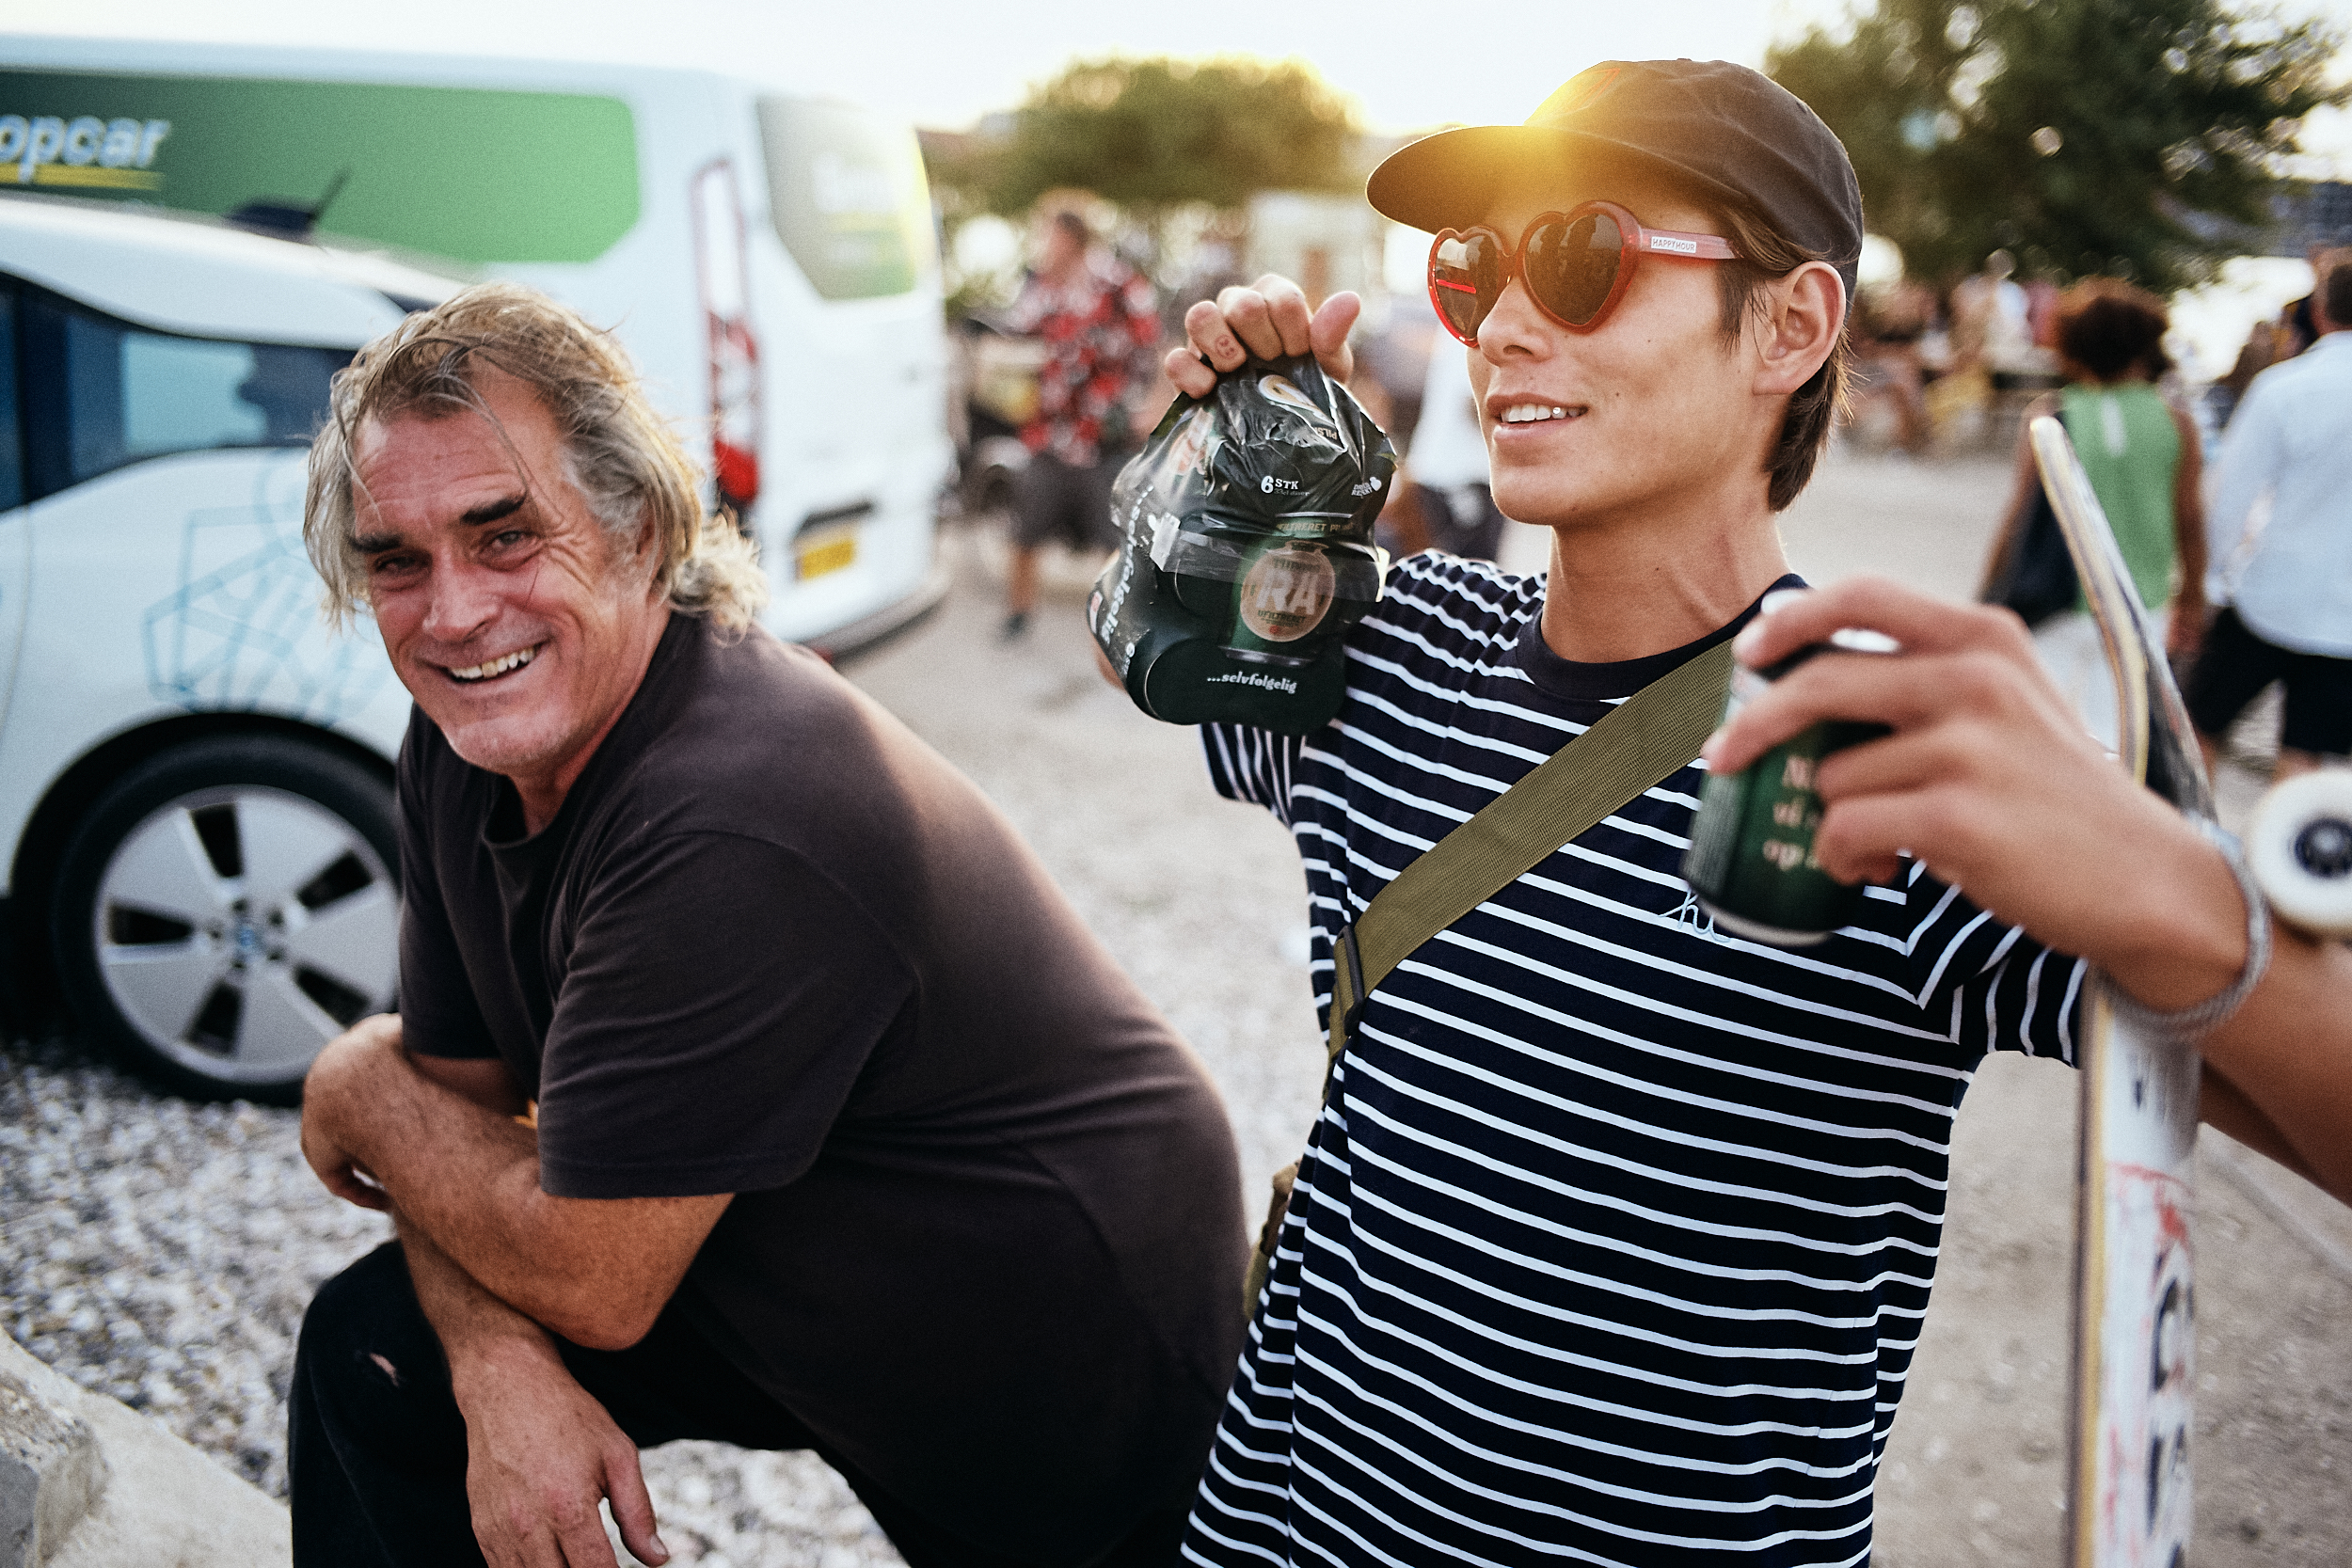 cph for the generations! Steve olson and evan mock, 2018 photo: arto saari